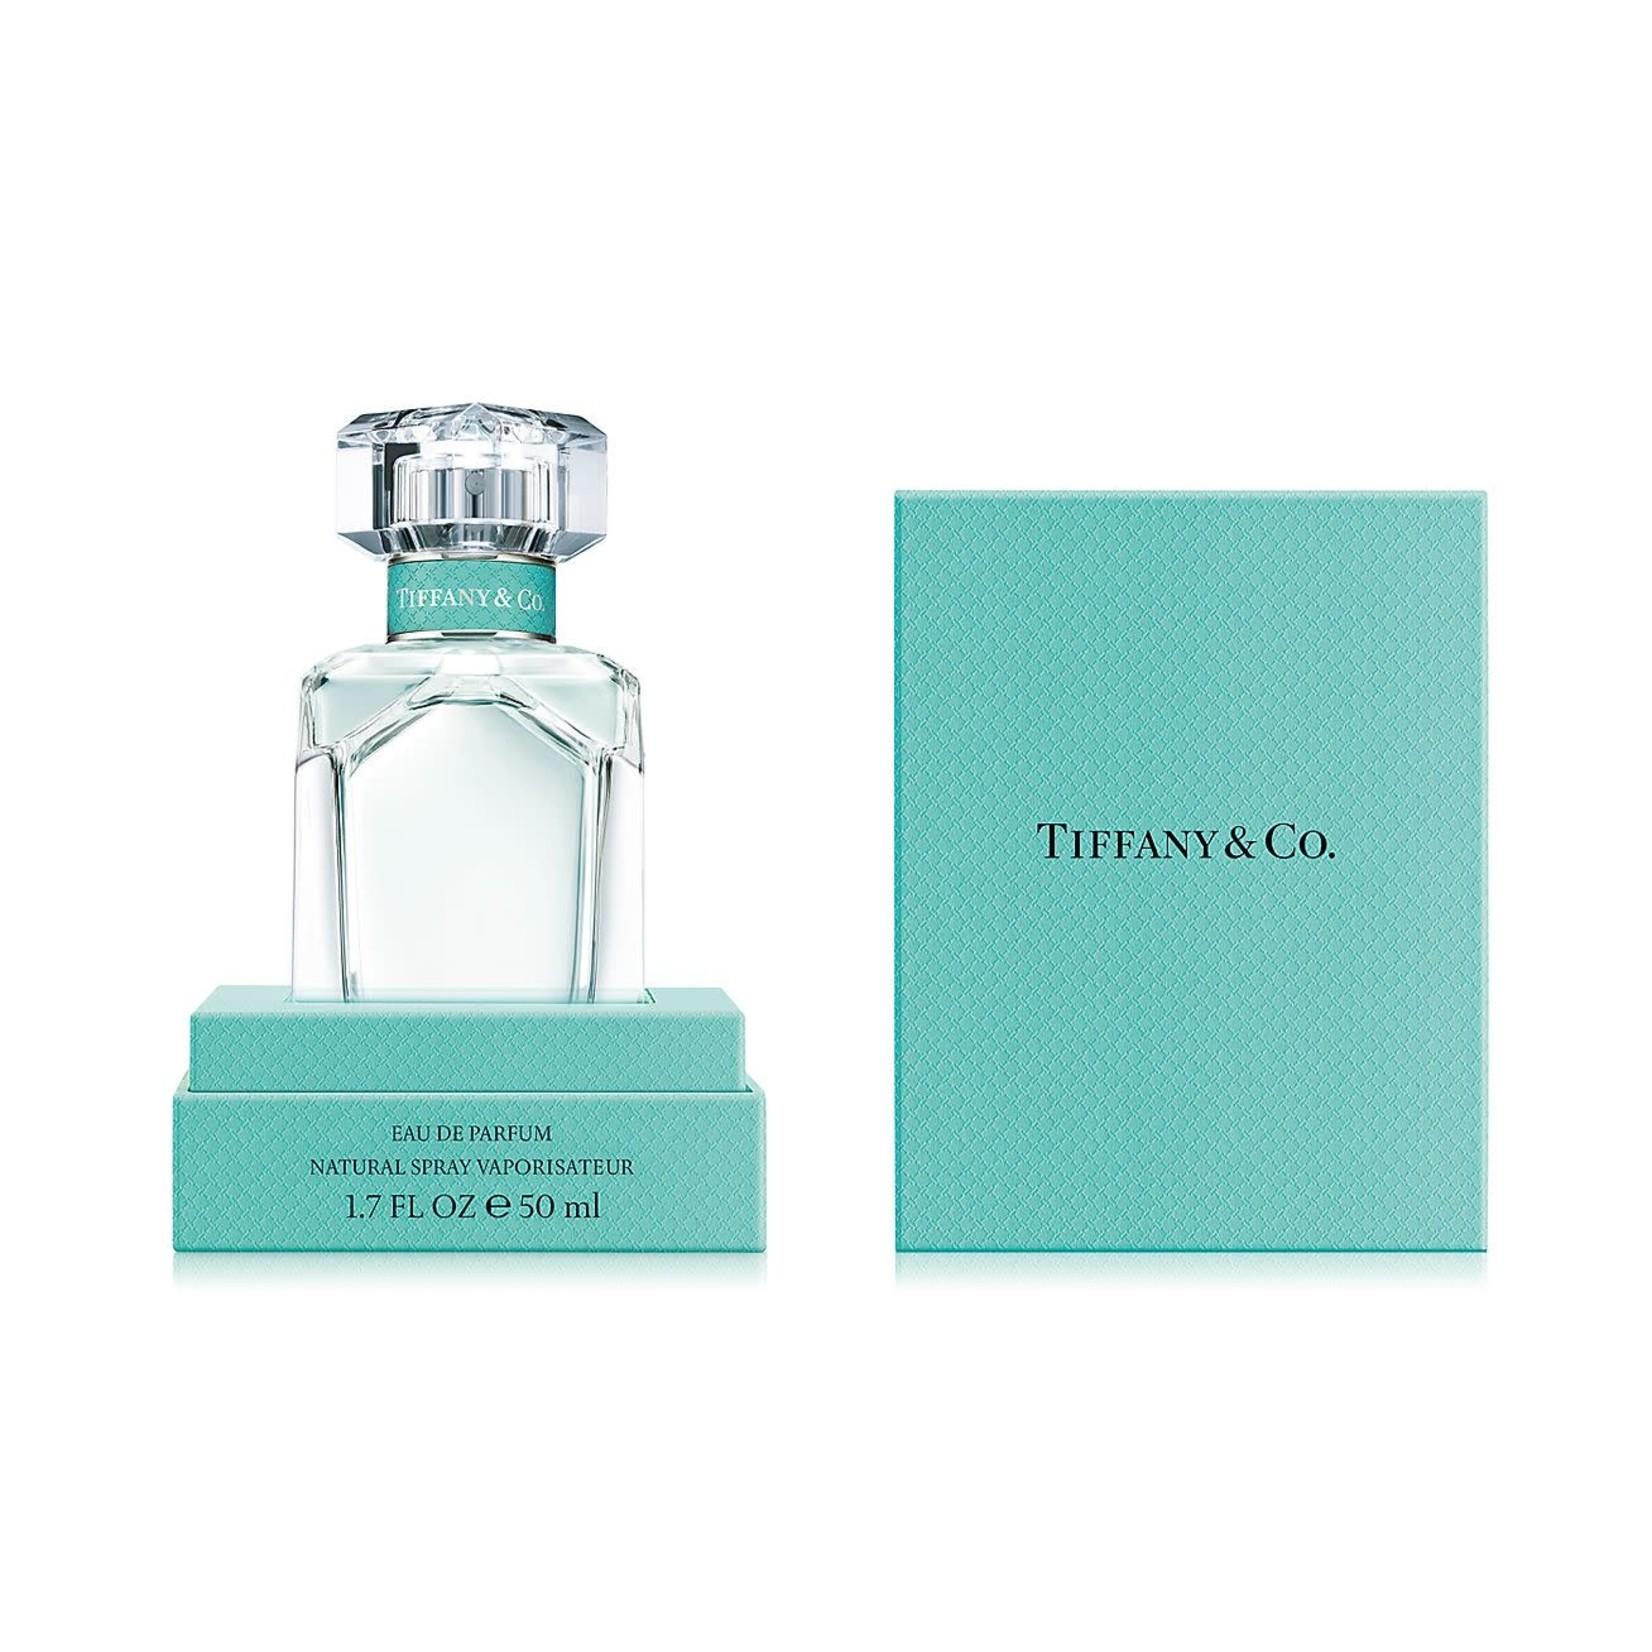 Tiffany & Co Eau De Parfum 50ml